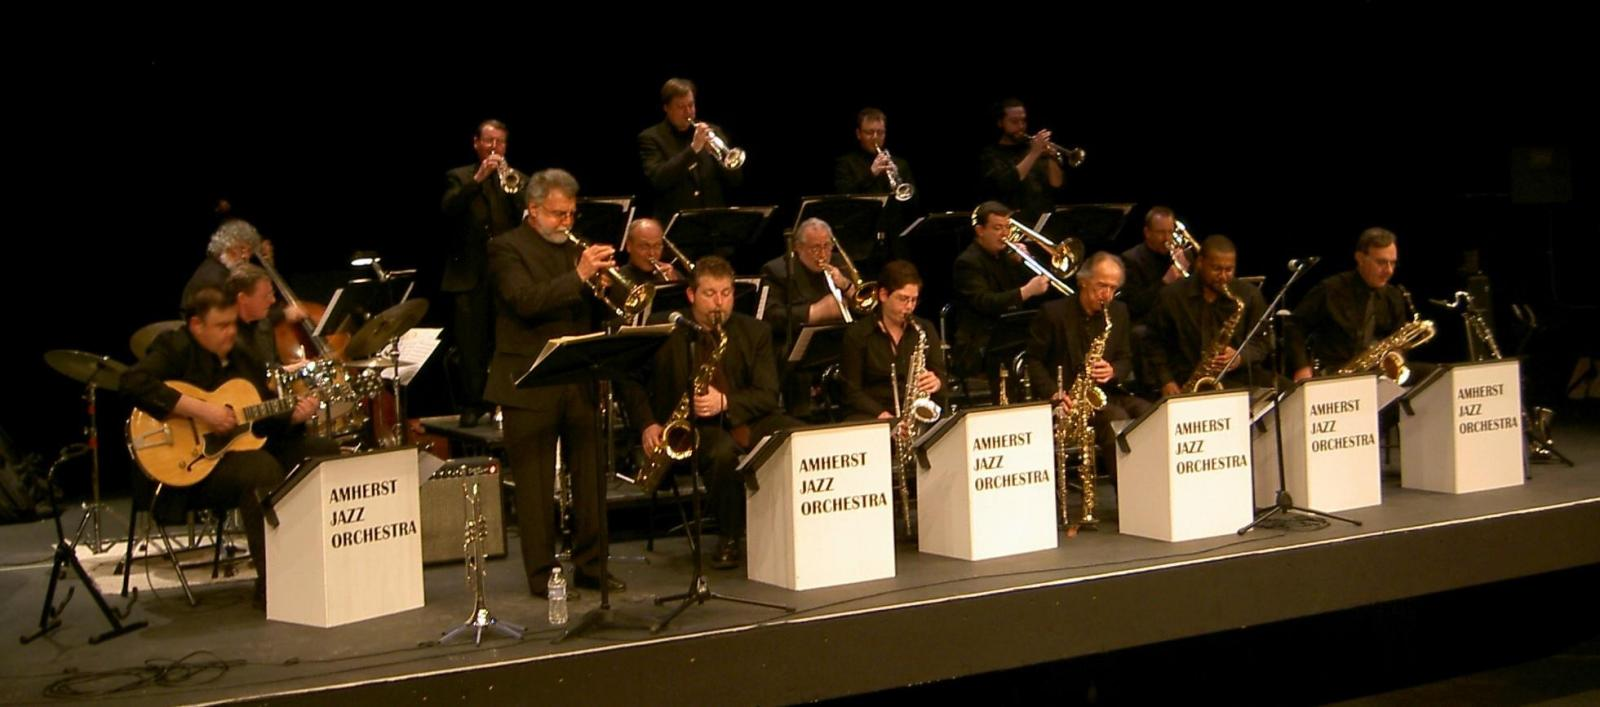 Dave Sporny's Amherst Jazz Orchestra